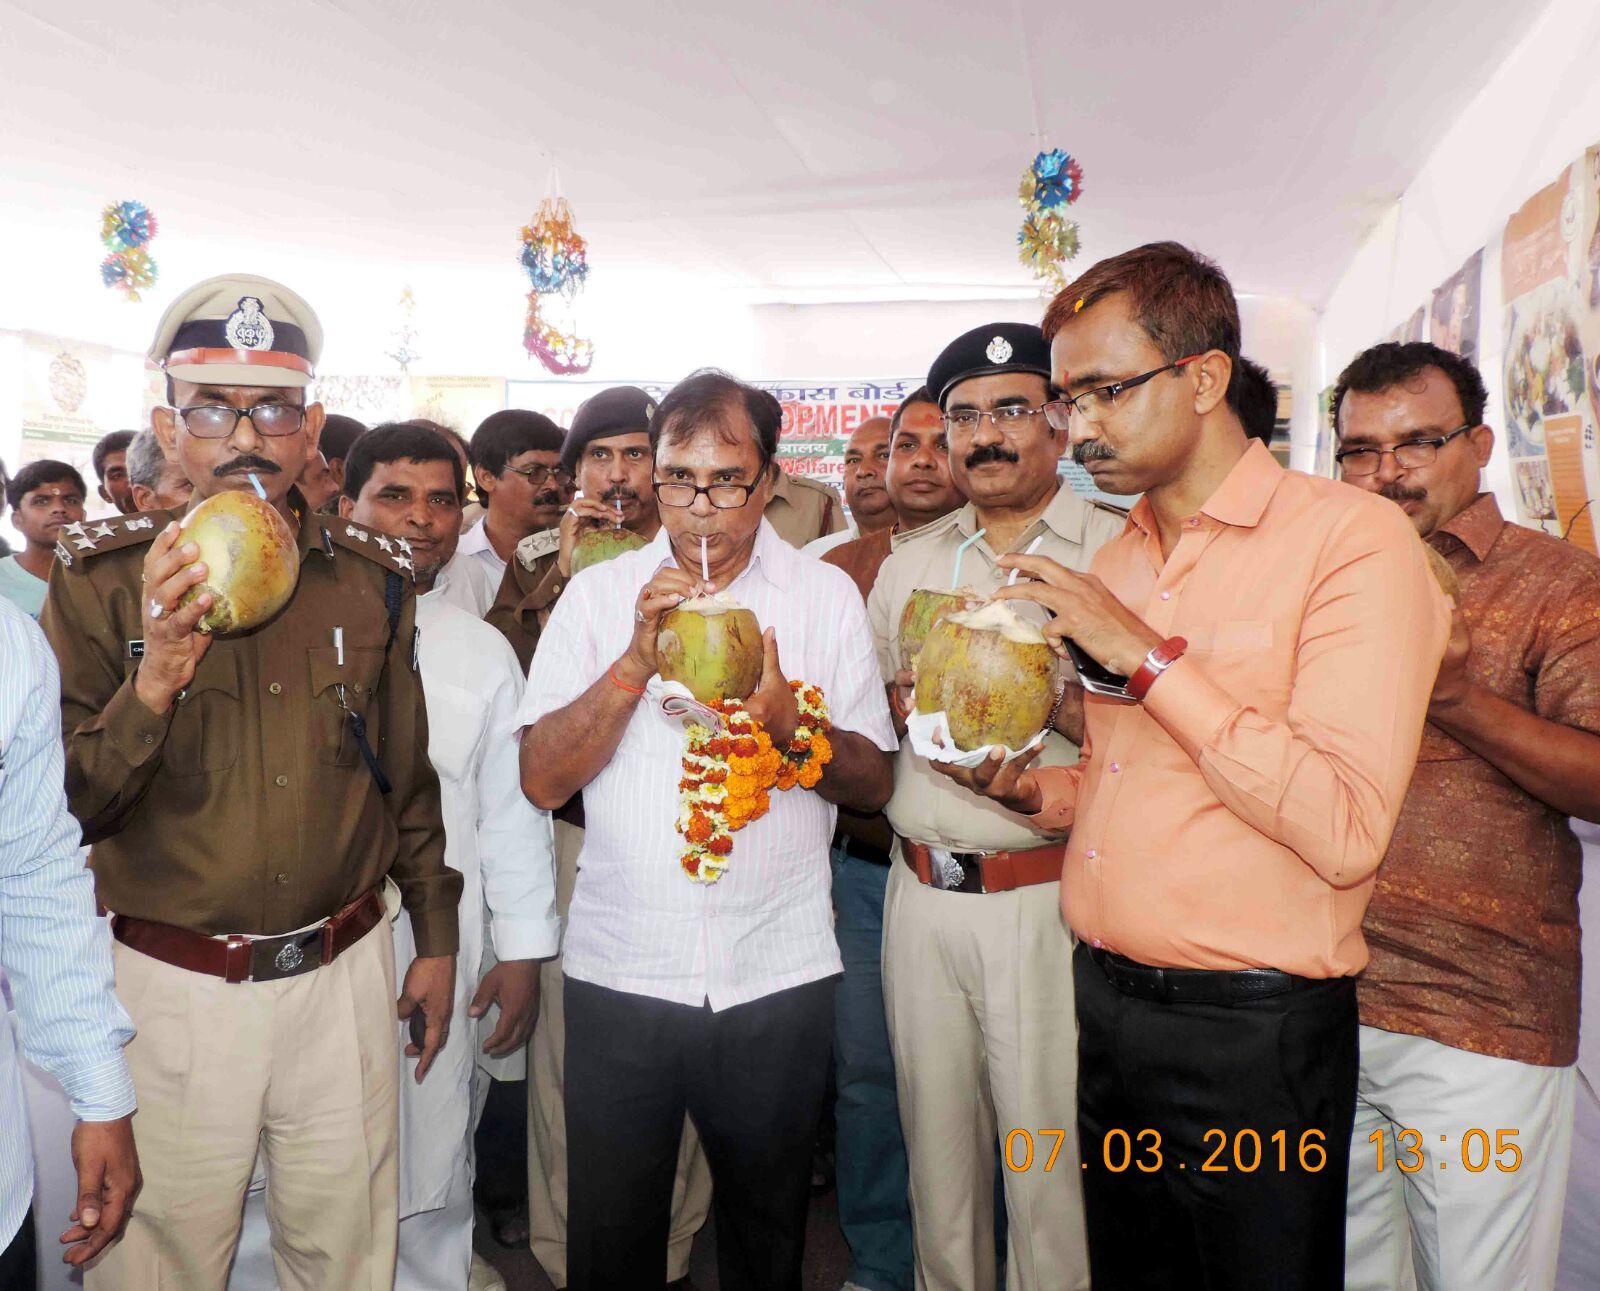 From L to R - DIG Chandrika Prasad, Dr. Madhepuri, SP Vikas Kumar, DM Md. Sohail, SDM Sanjay Kumar Nirala enjoying coconut water in Mela campus after inauguration of Coconut Stall.